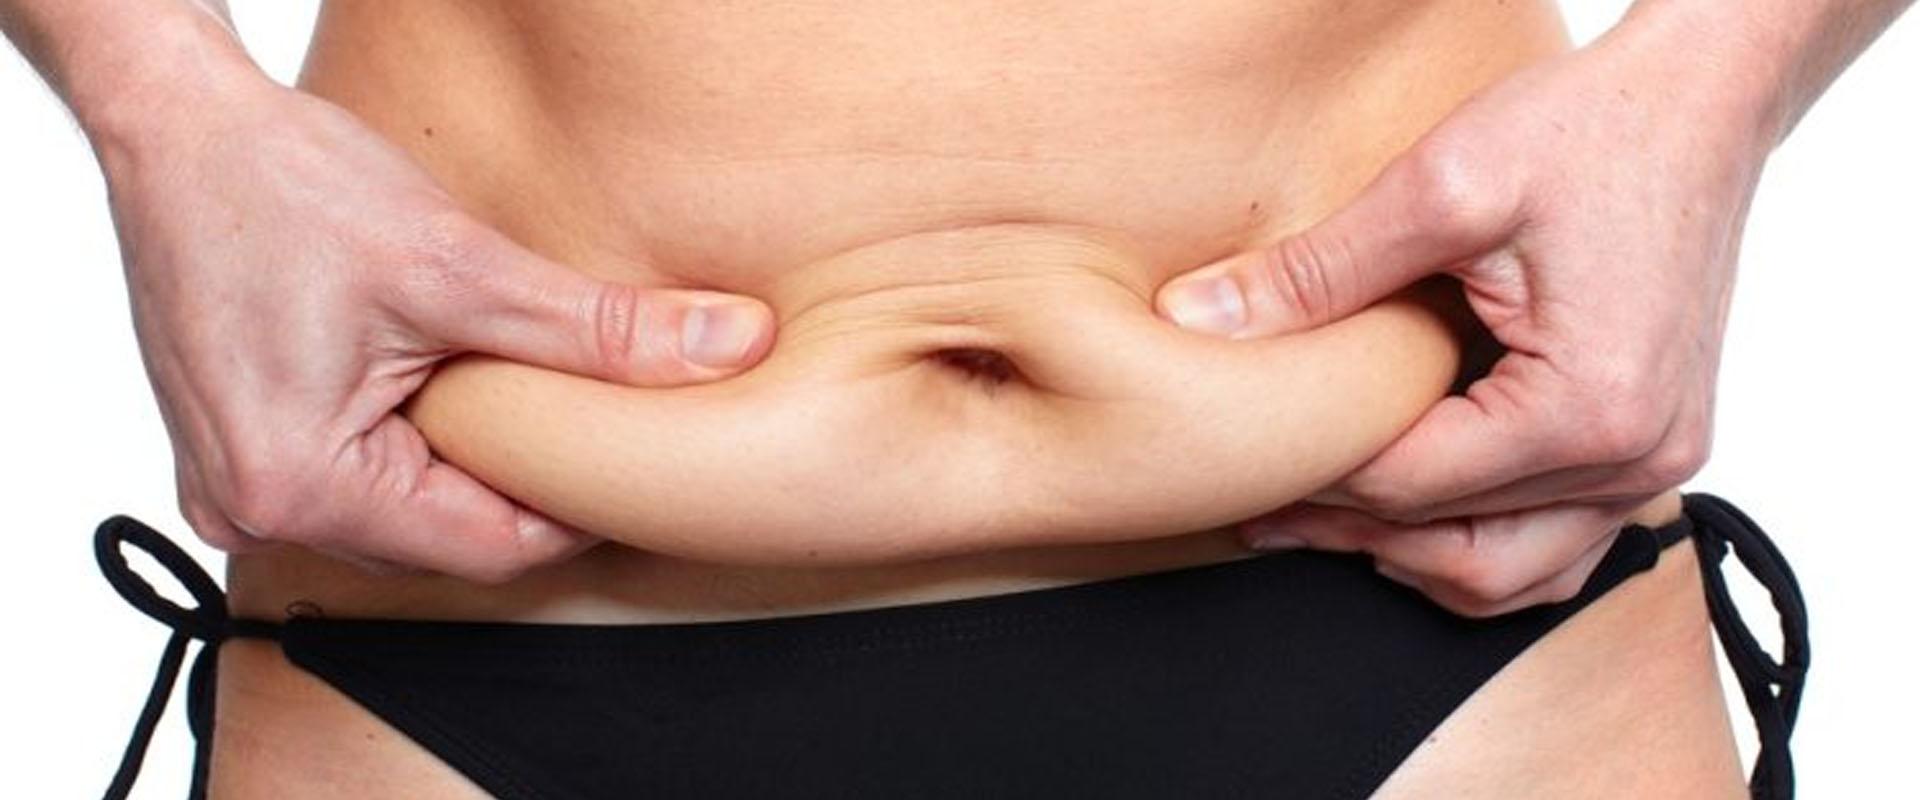 Tummy Tuck | Abdominoplasty